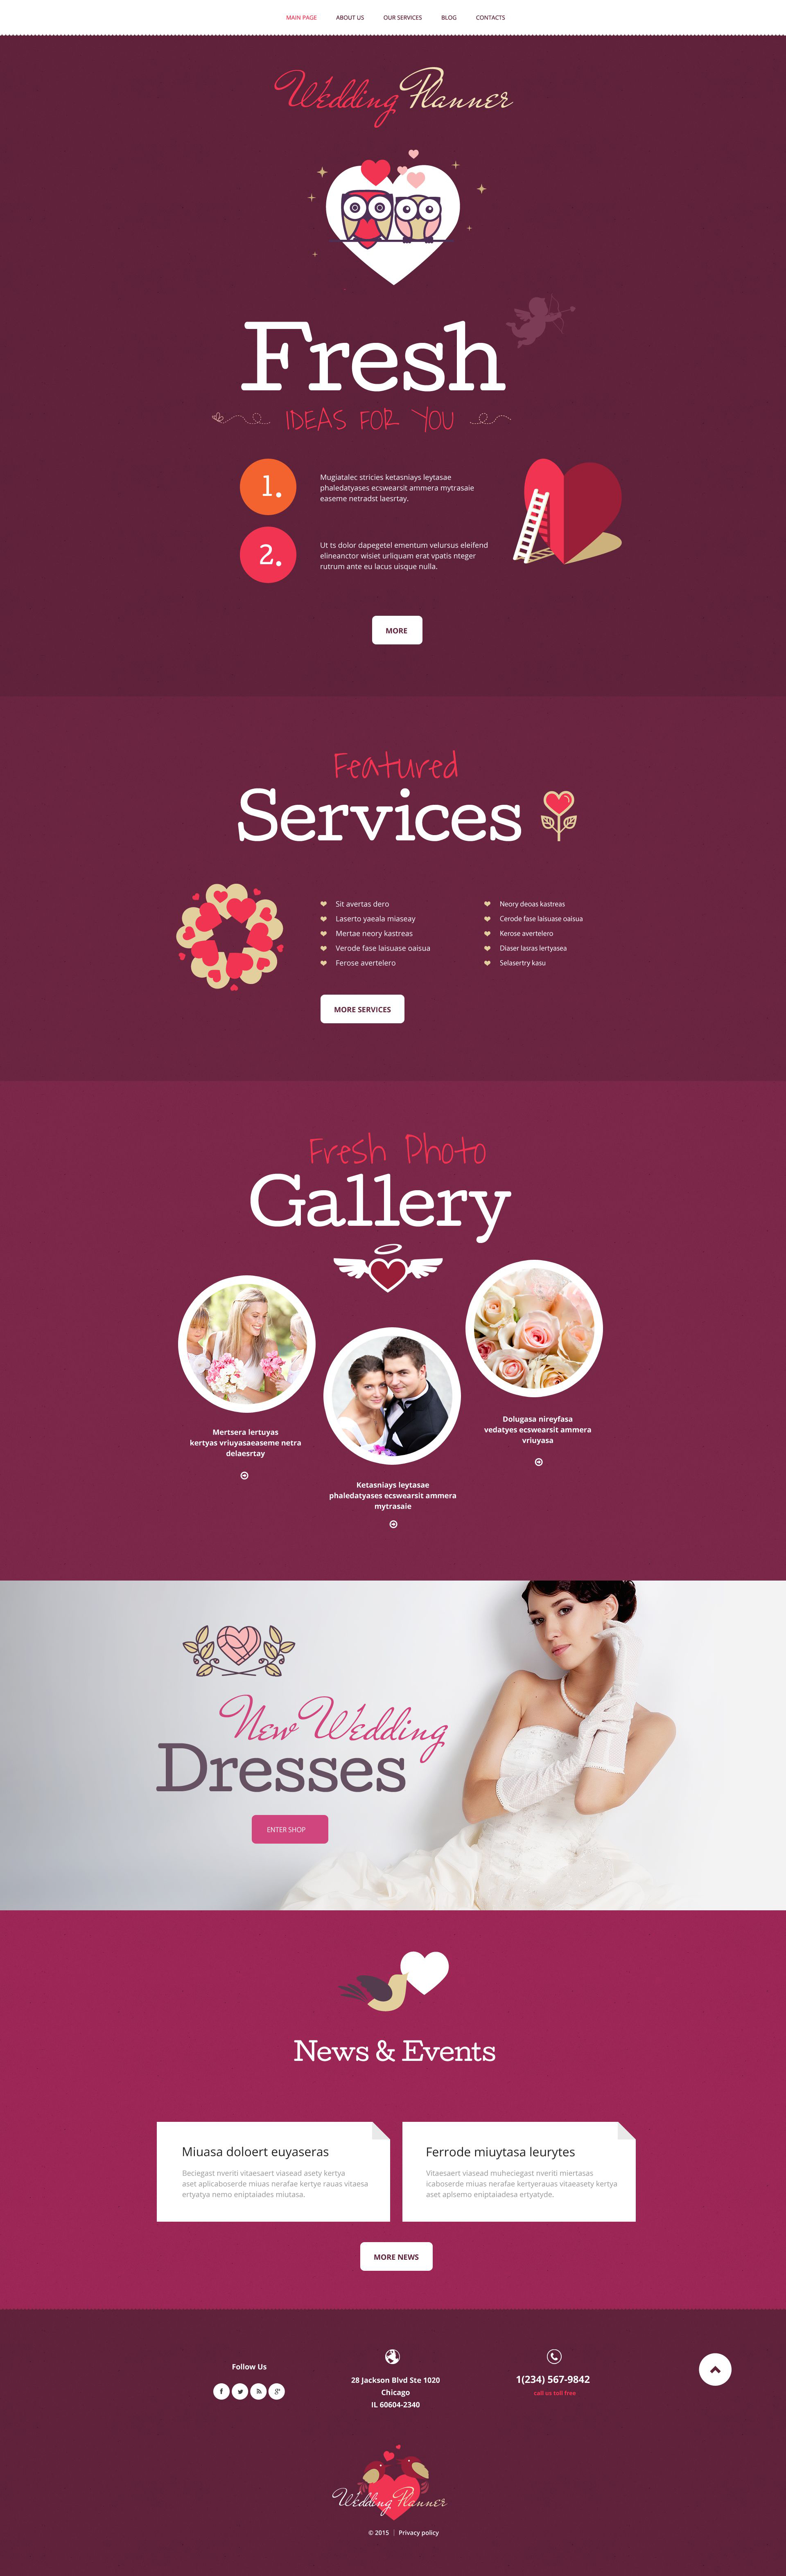 """Planificateur de mariage"" thème WordPress adaptatif #55043 - screenshot"